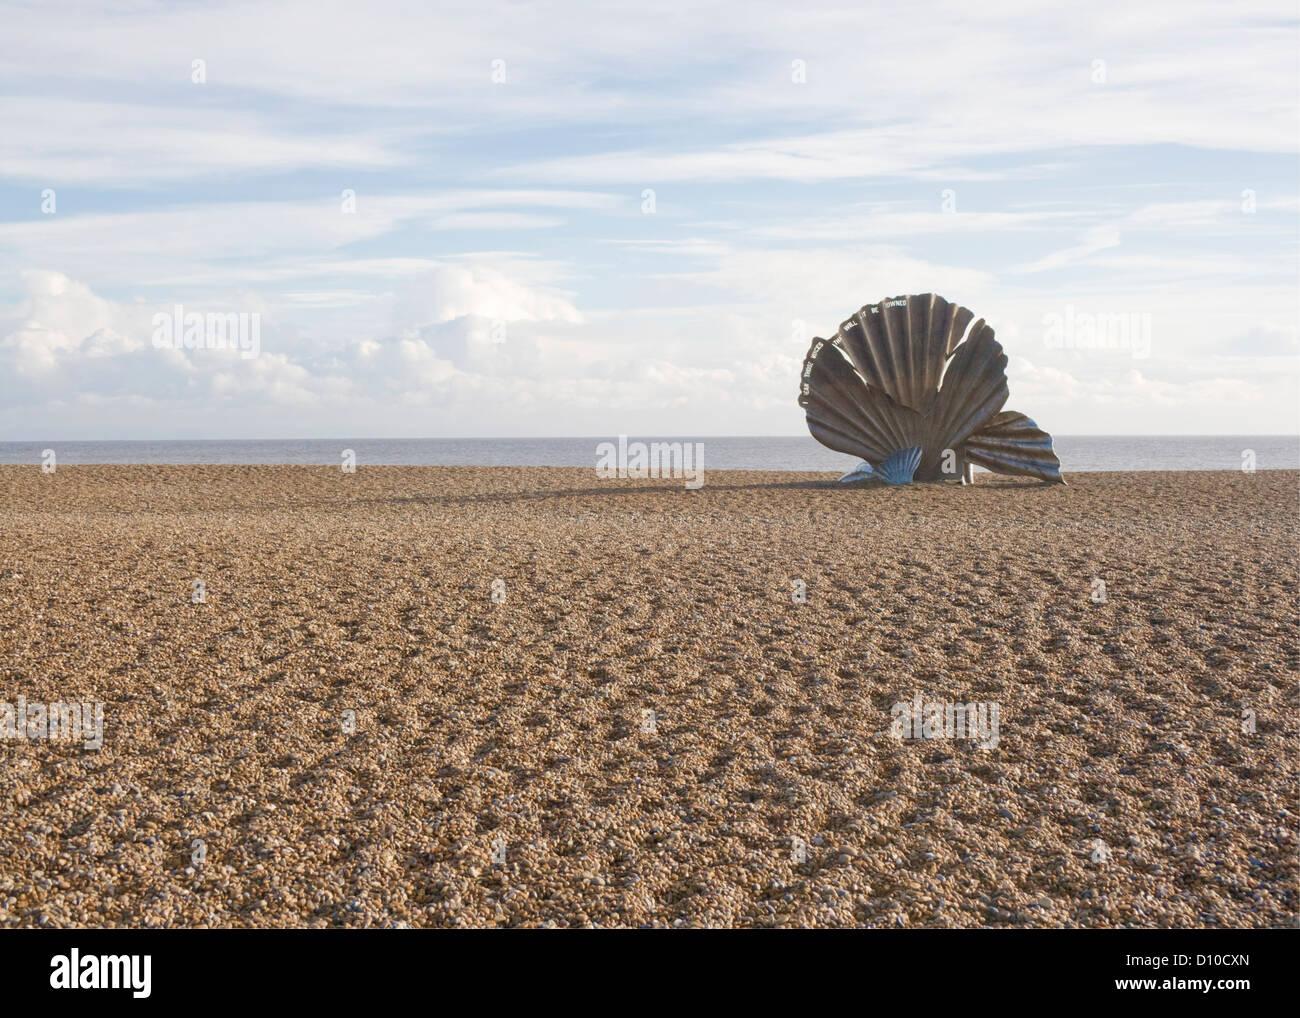 Maggi Hambling's sculpture 'Scallop' on Aldeburgh beach in Suffolk, England. - Stock Image